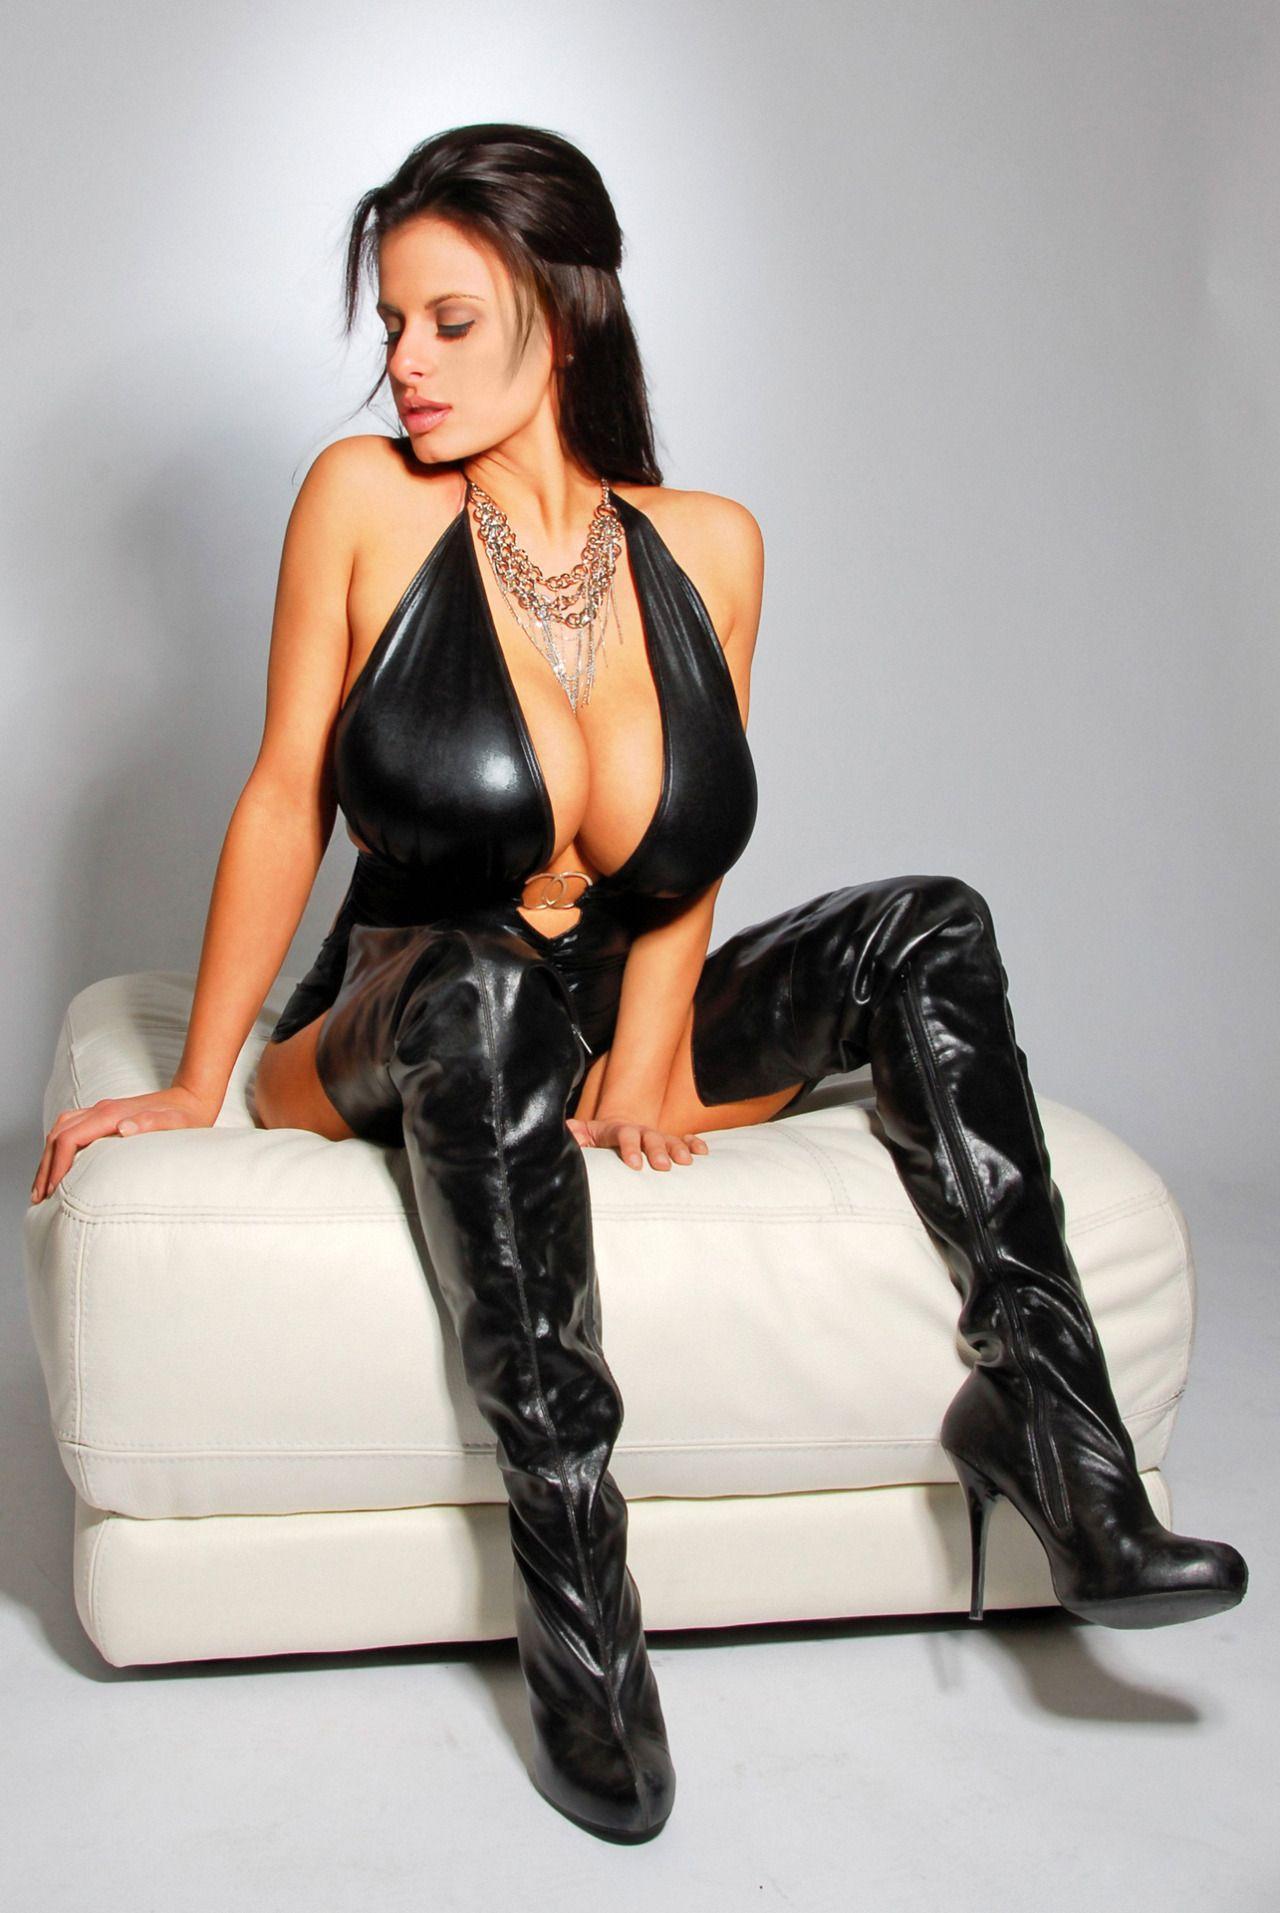 girls boots Hot wearing